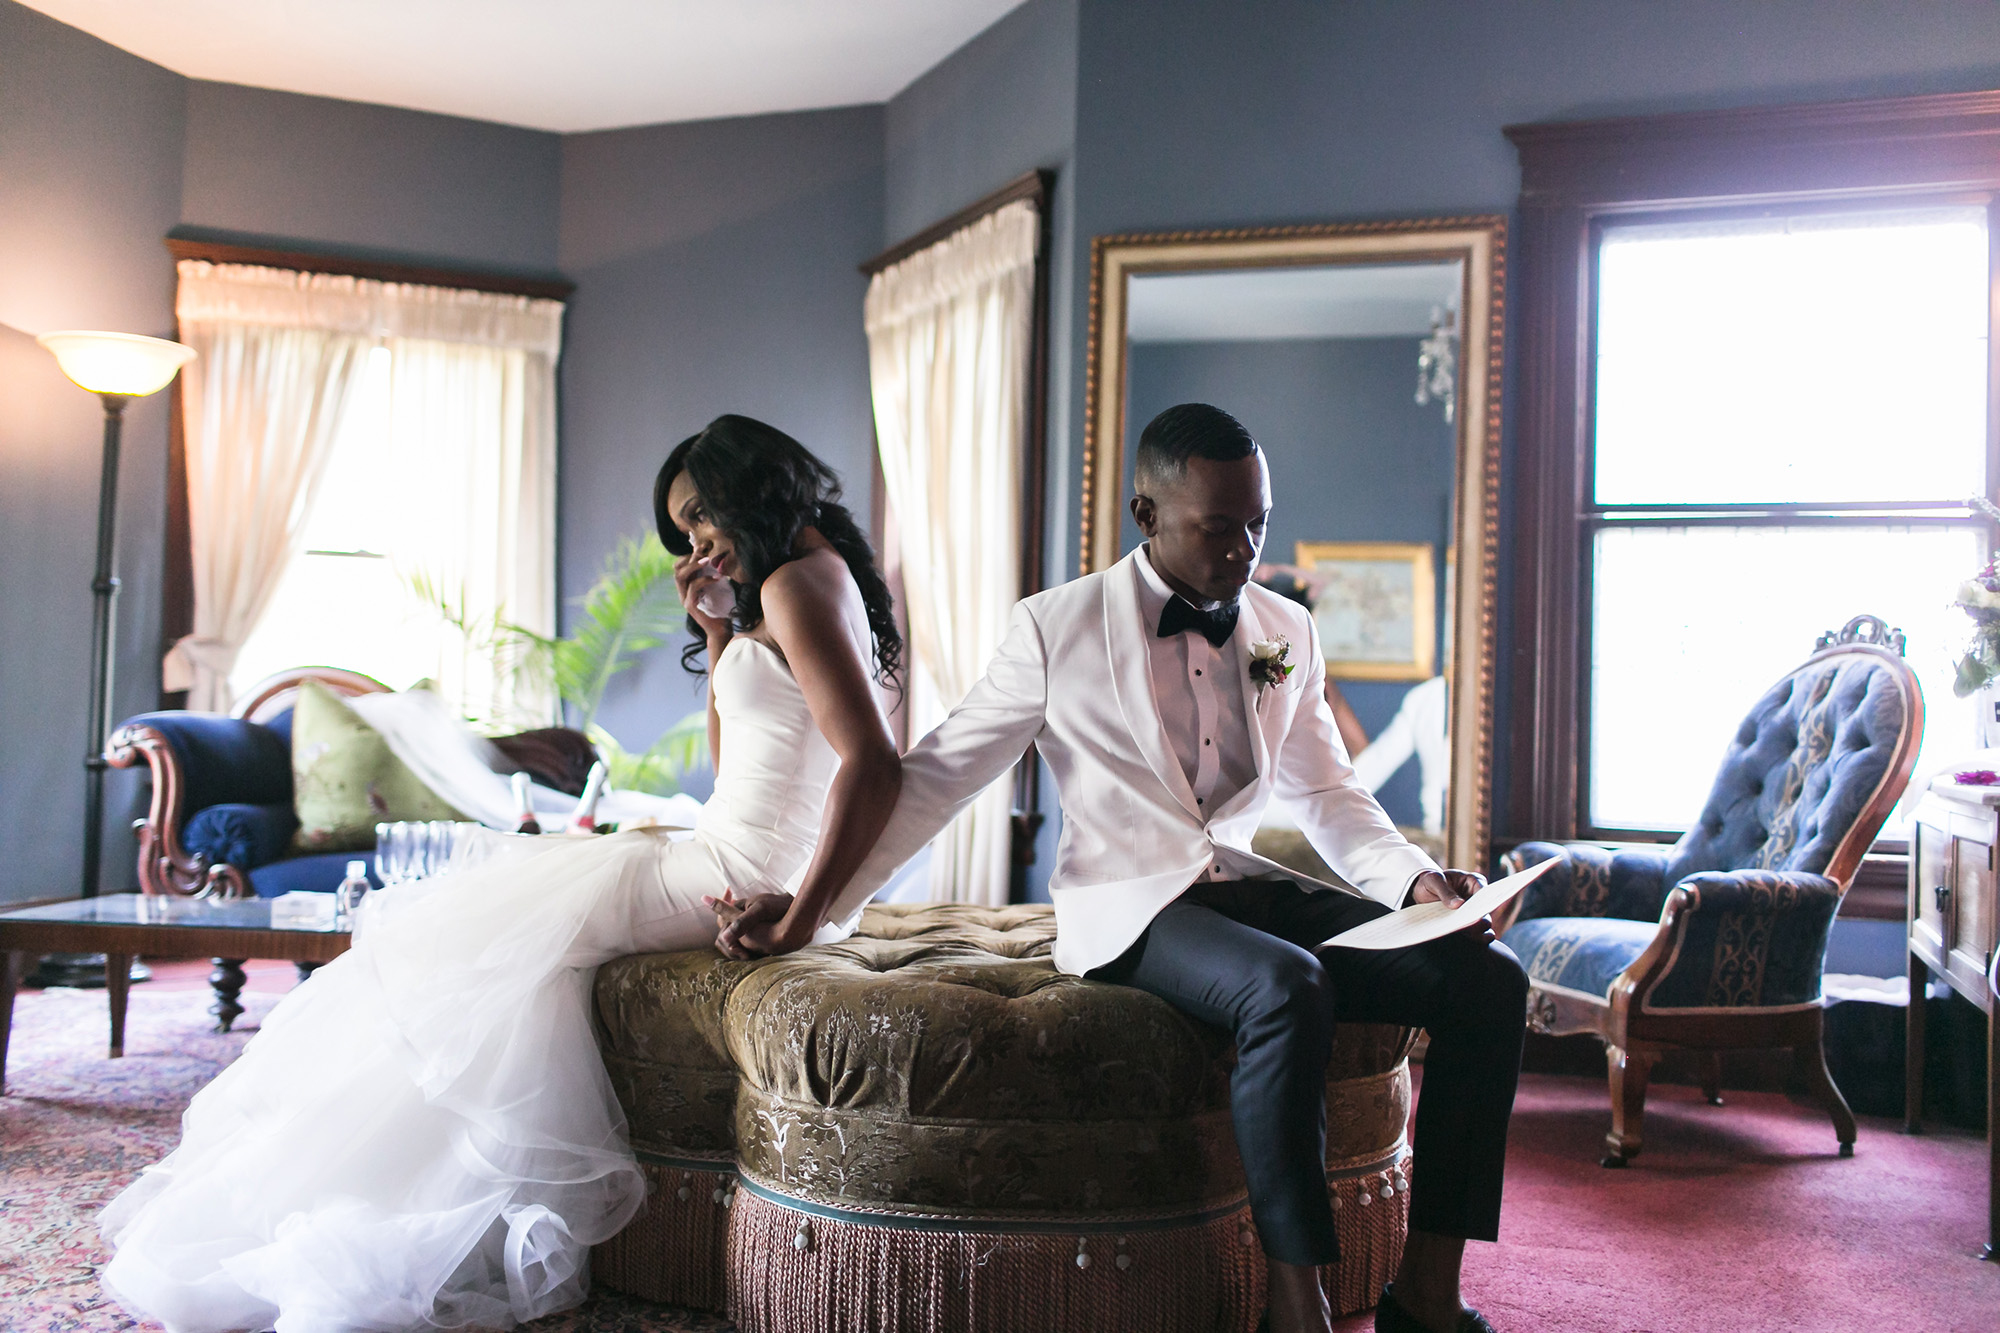 associate-photographer-christmas-house-wedding-carrie-vines-0142.jpg